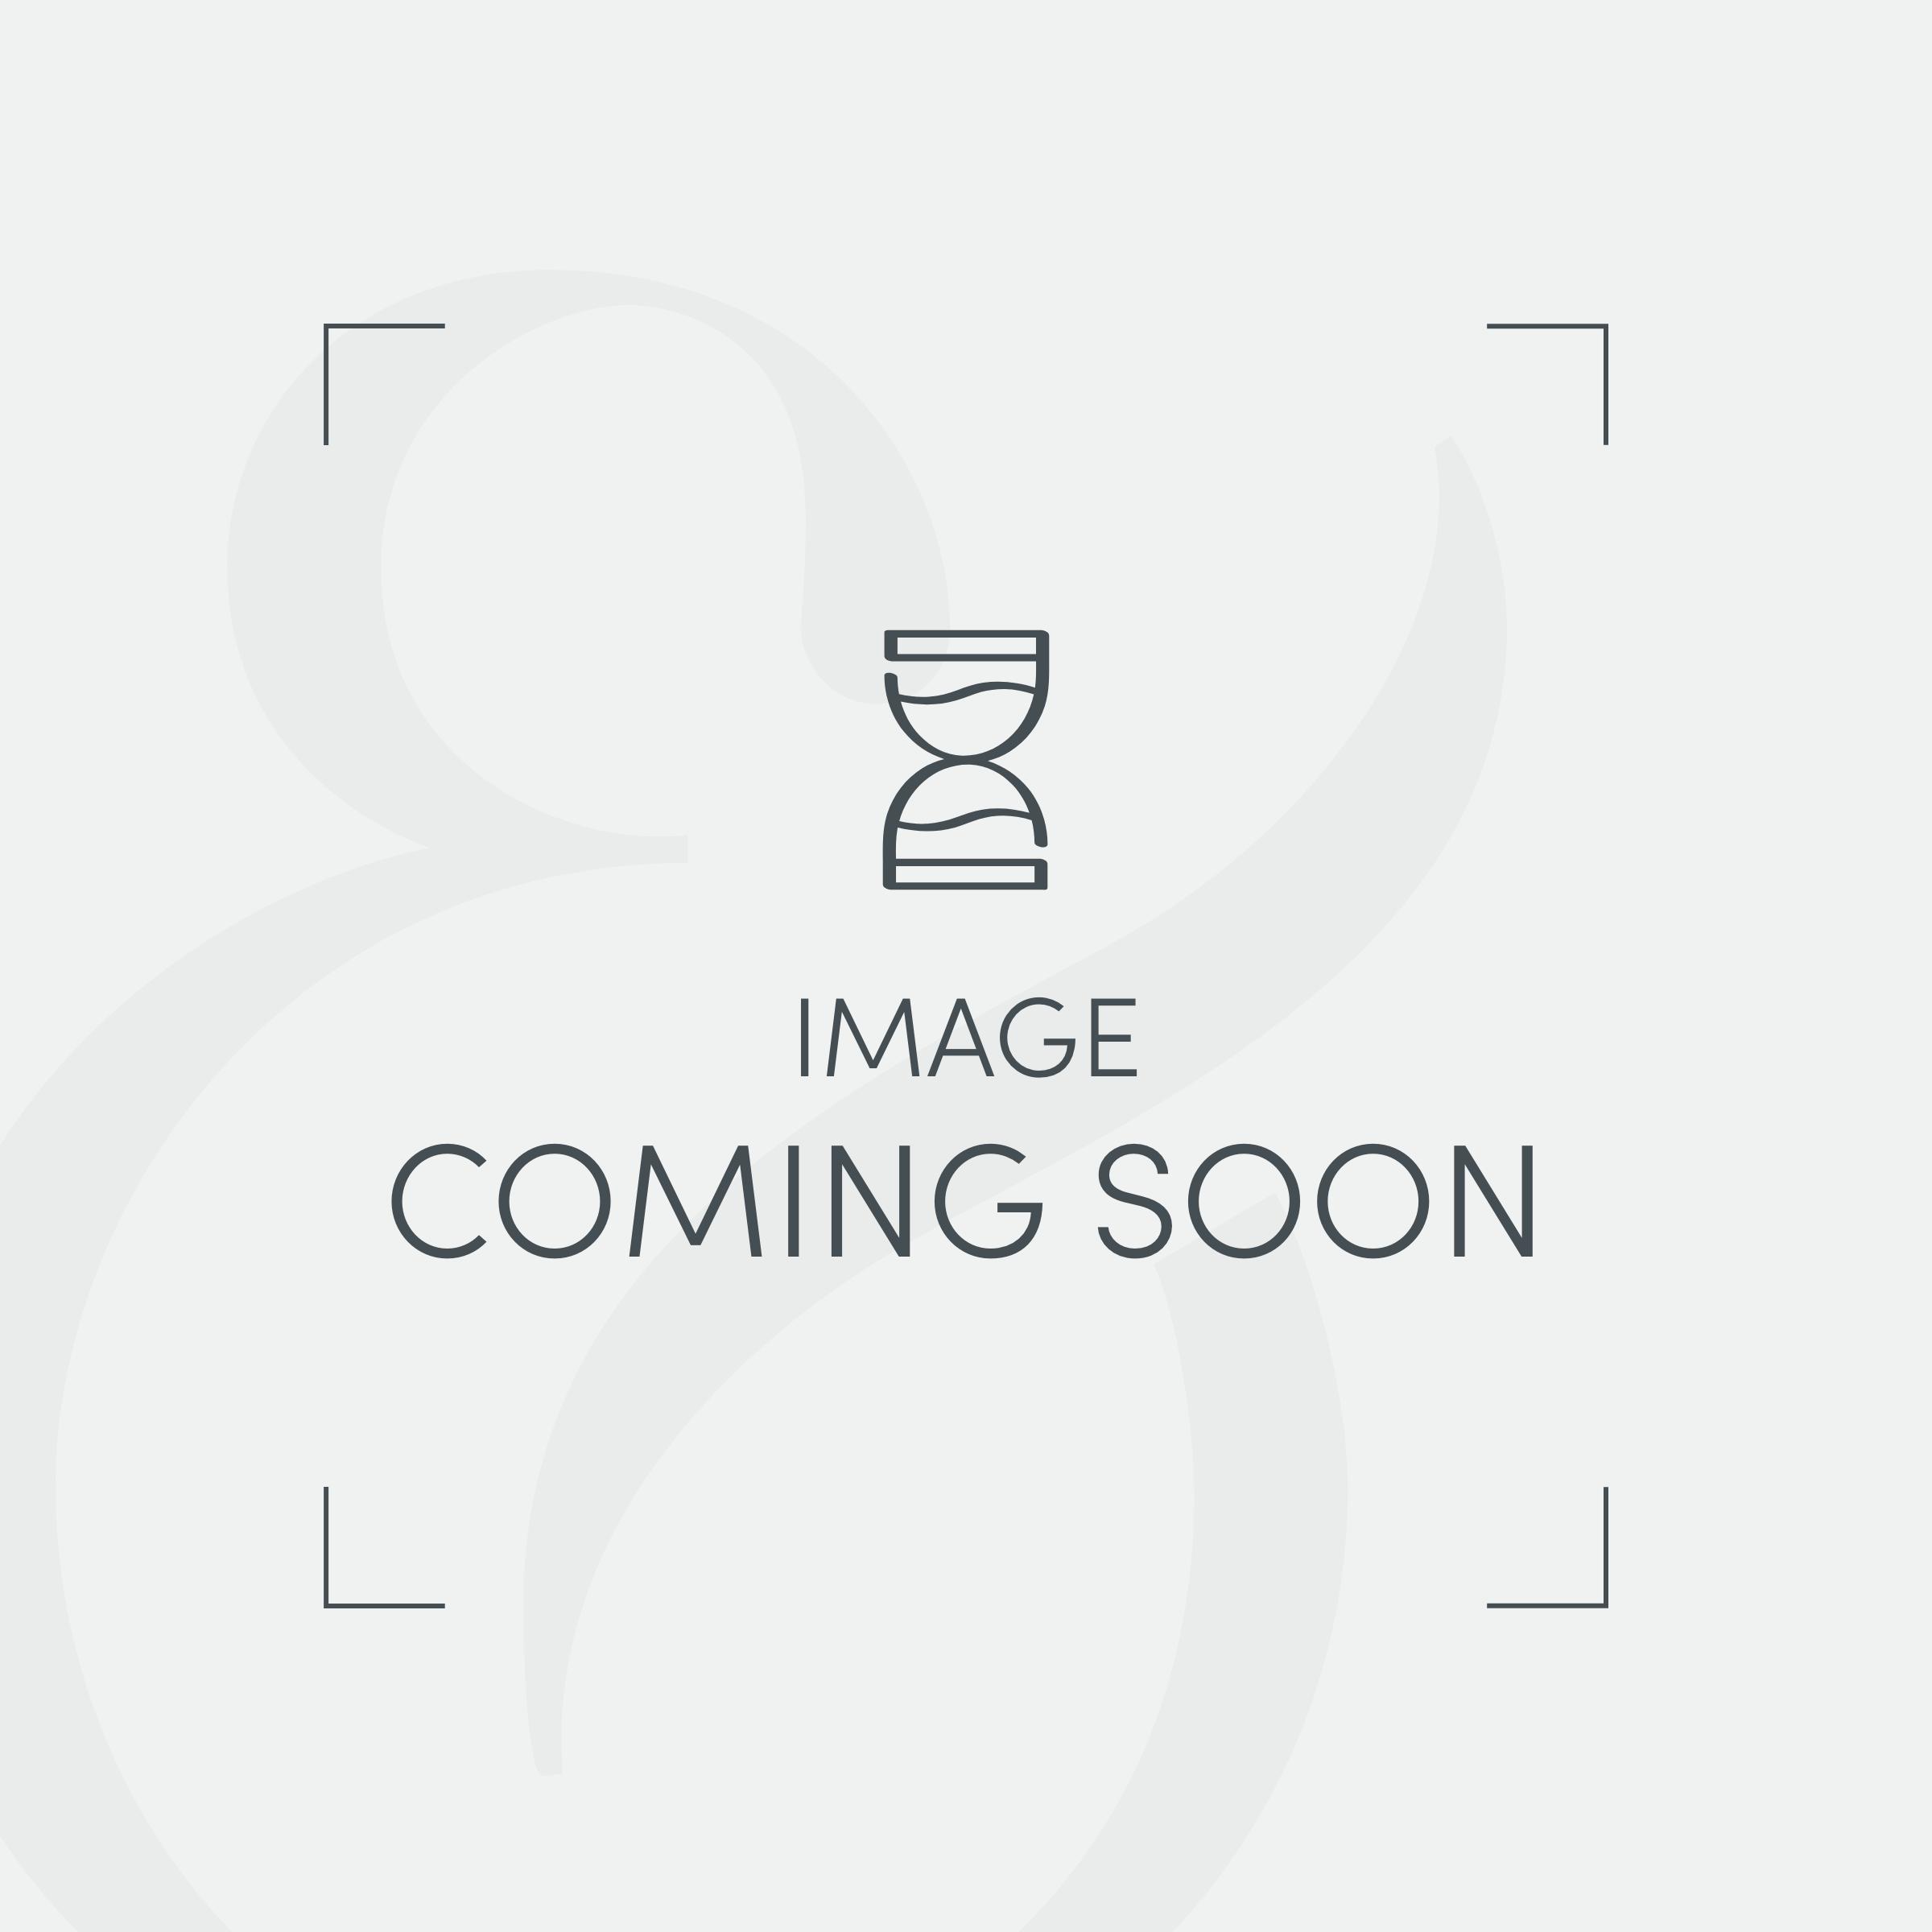 300 Thread Count Cotton Sateen Bed Linen *Special Buy*